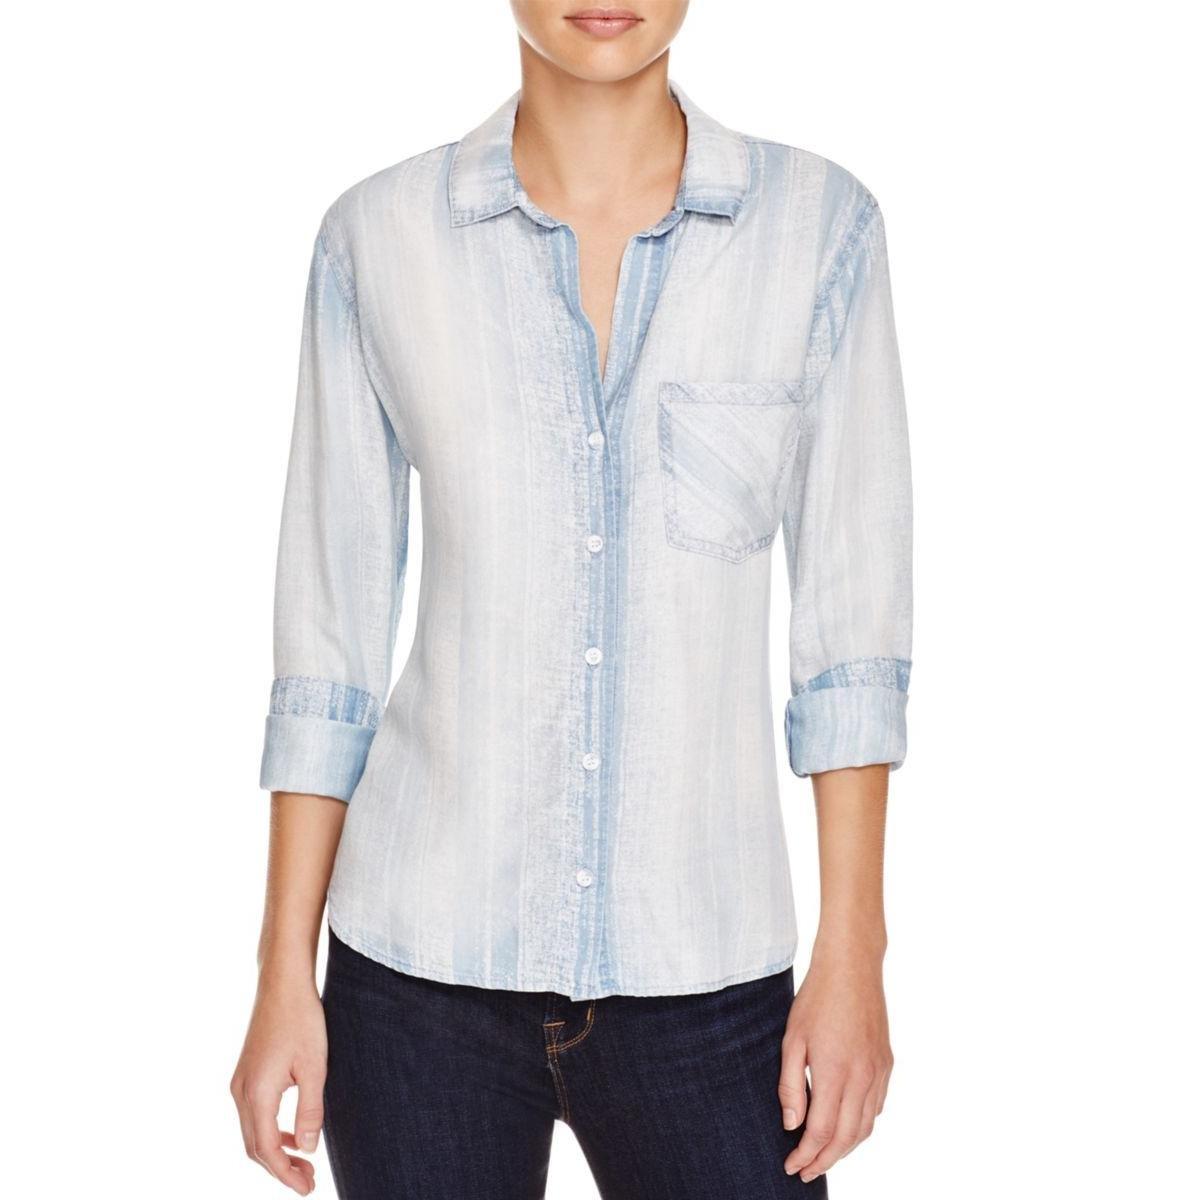 Bella Dahl Womens Printed Long Sleeves Button-Down Top Blue L